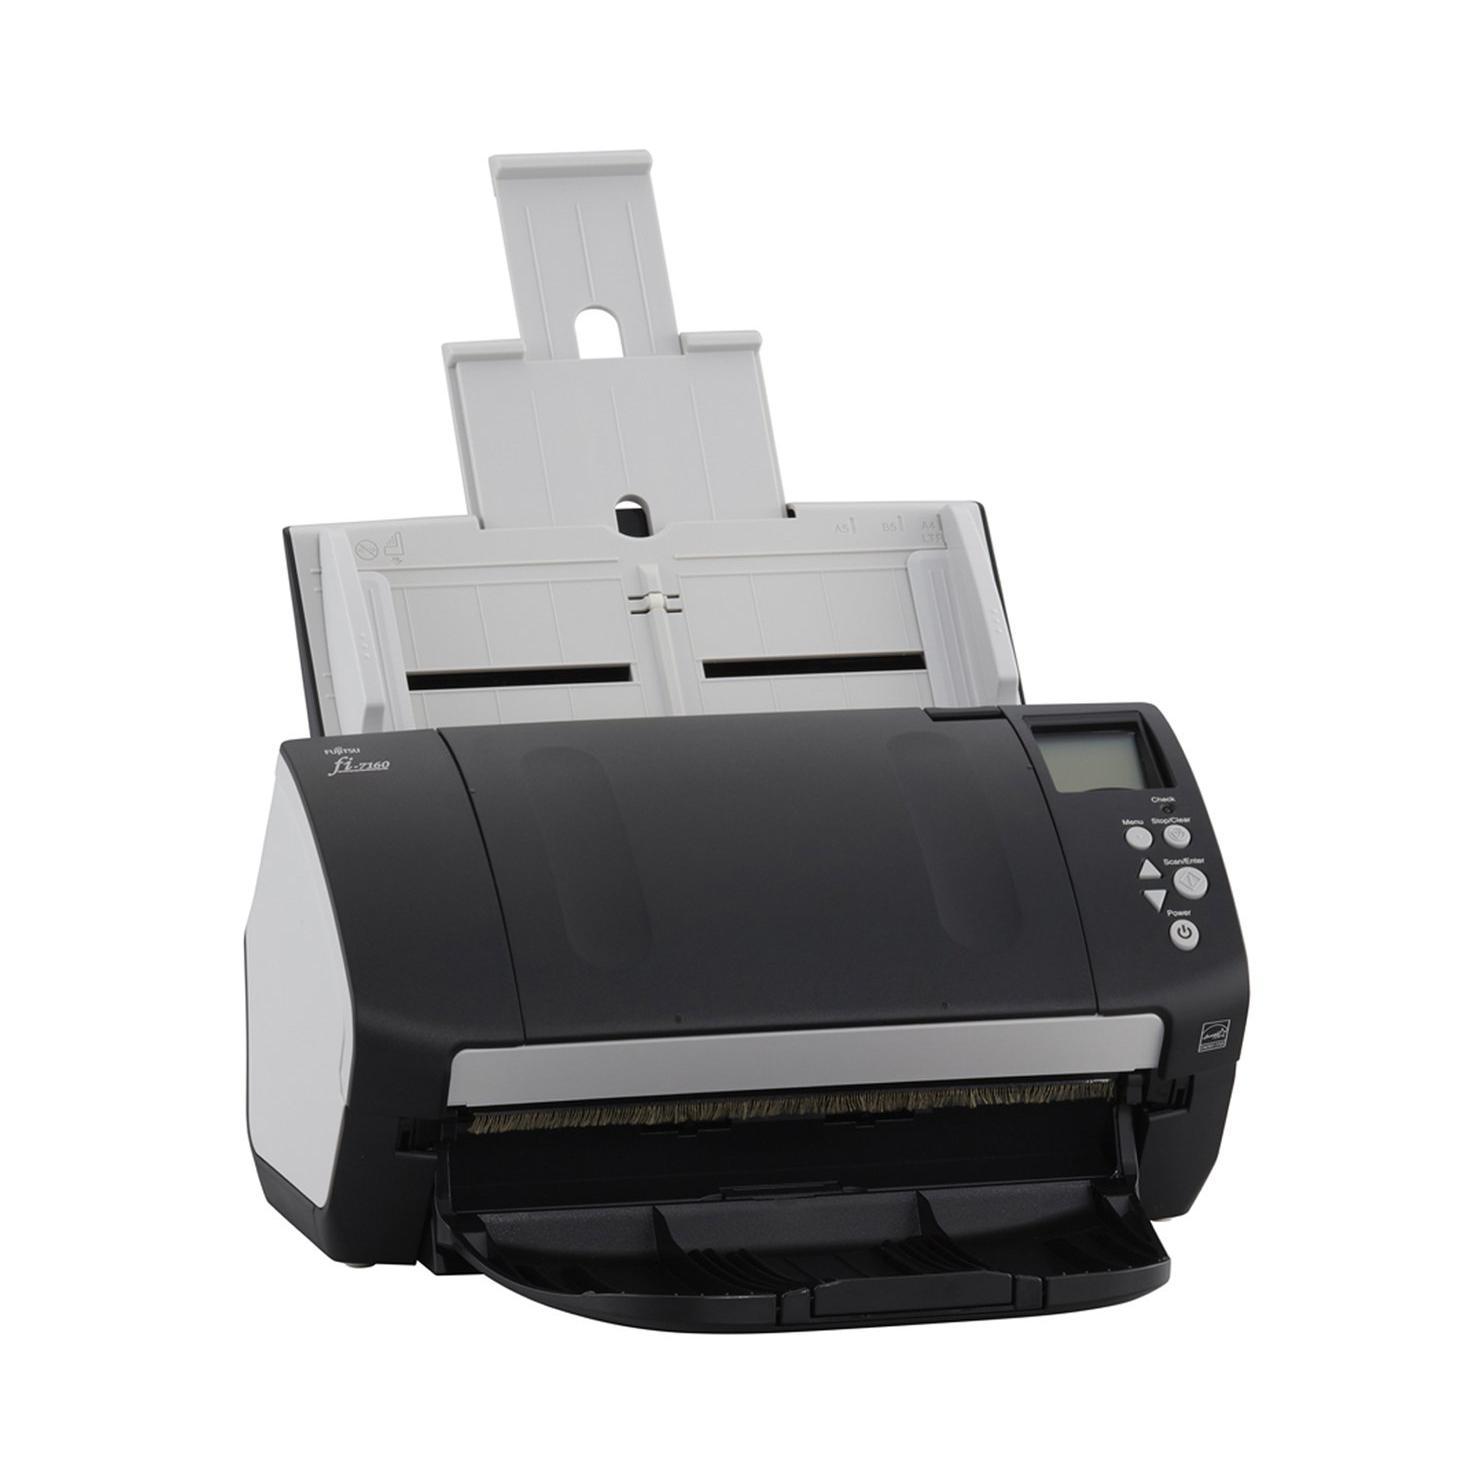 Scanner  Fujitsu fi-7160 - Black